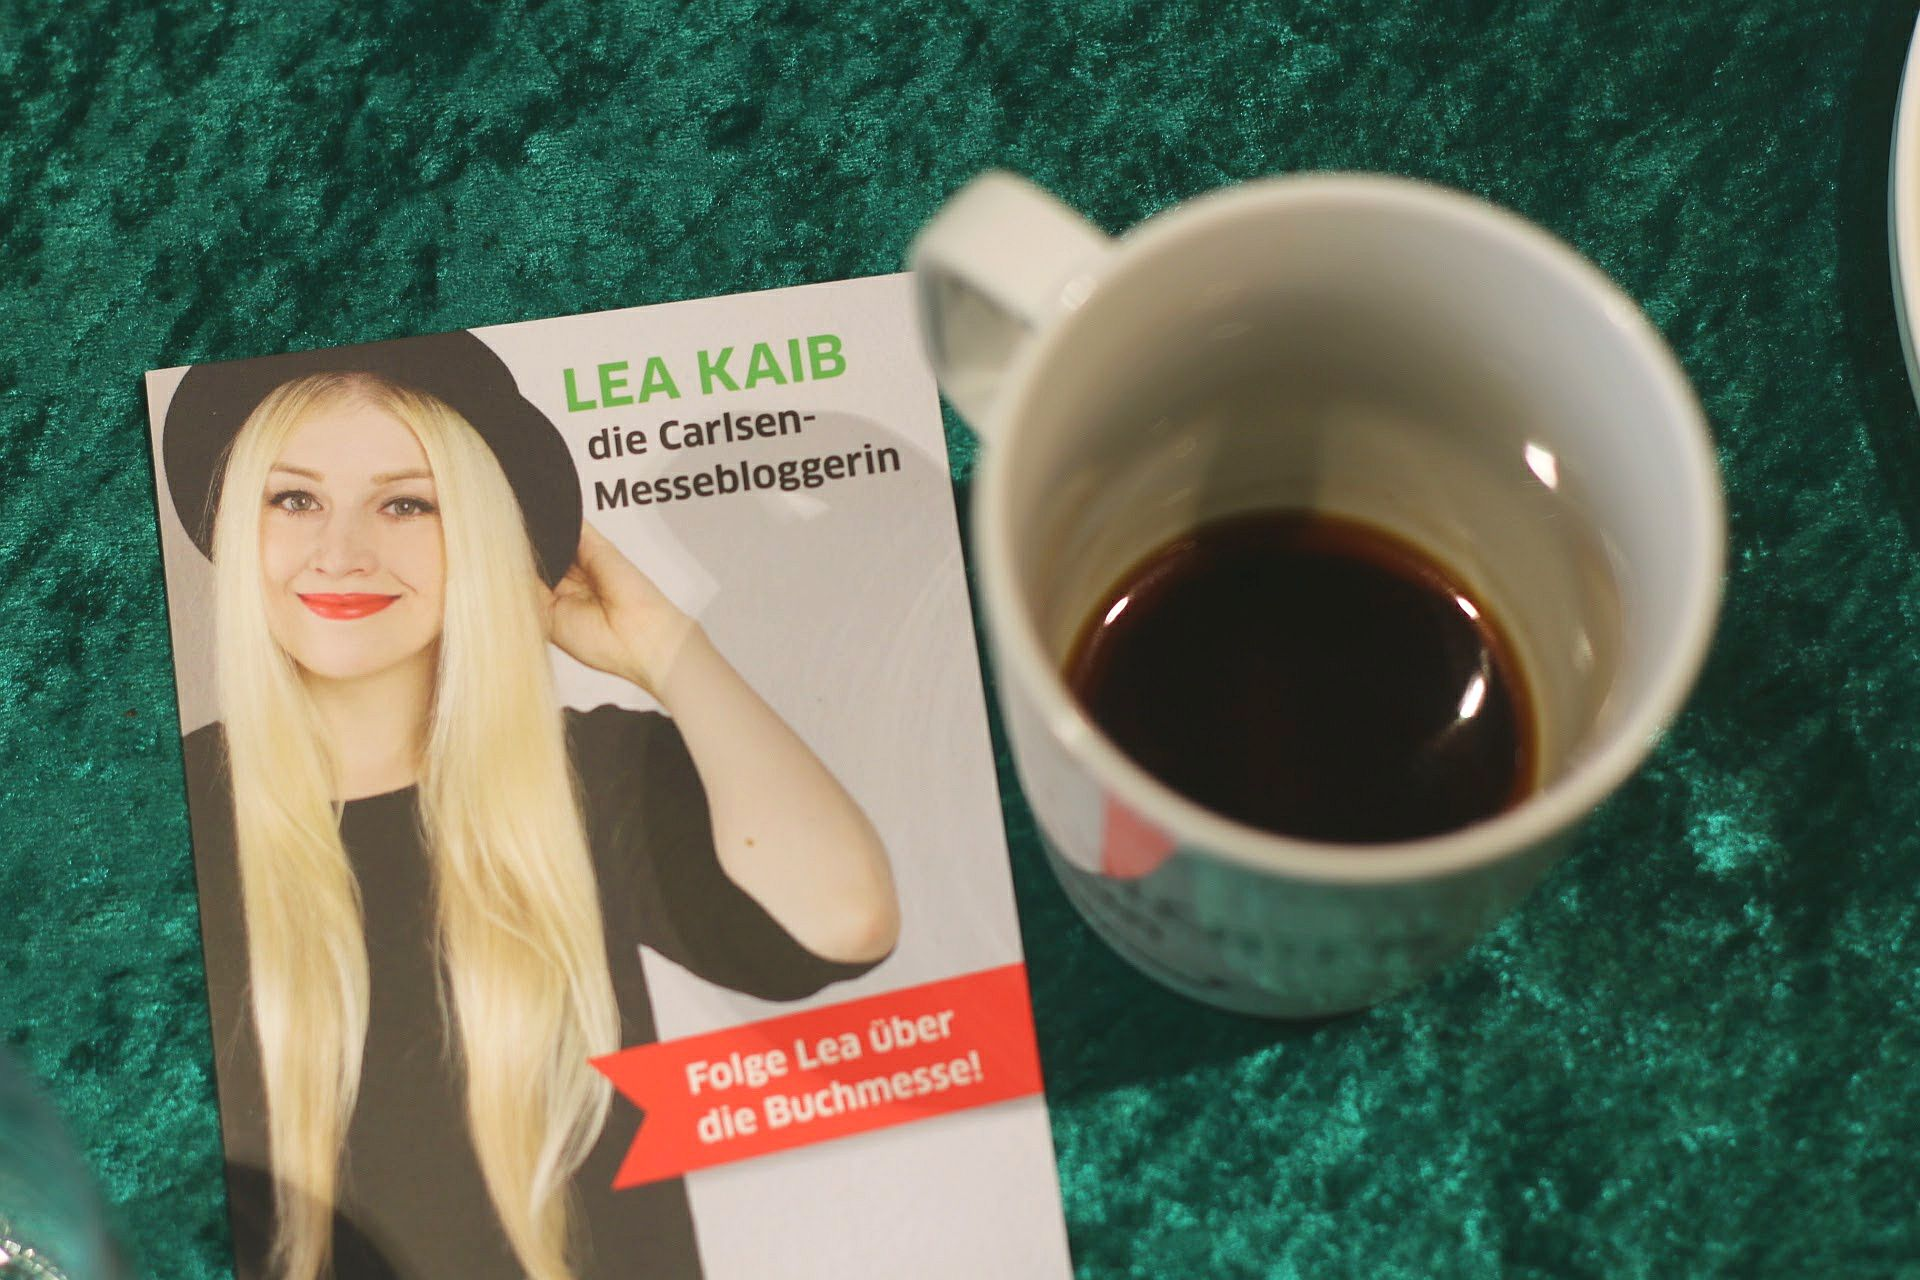 Blogger-Event Lea Kaib Messebloggerin Carlsen Visitenkarte Kaffee